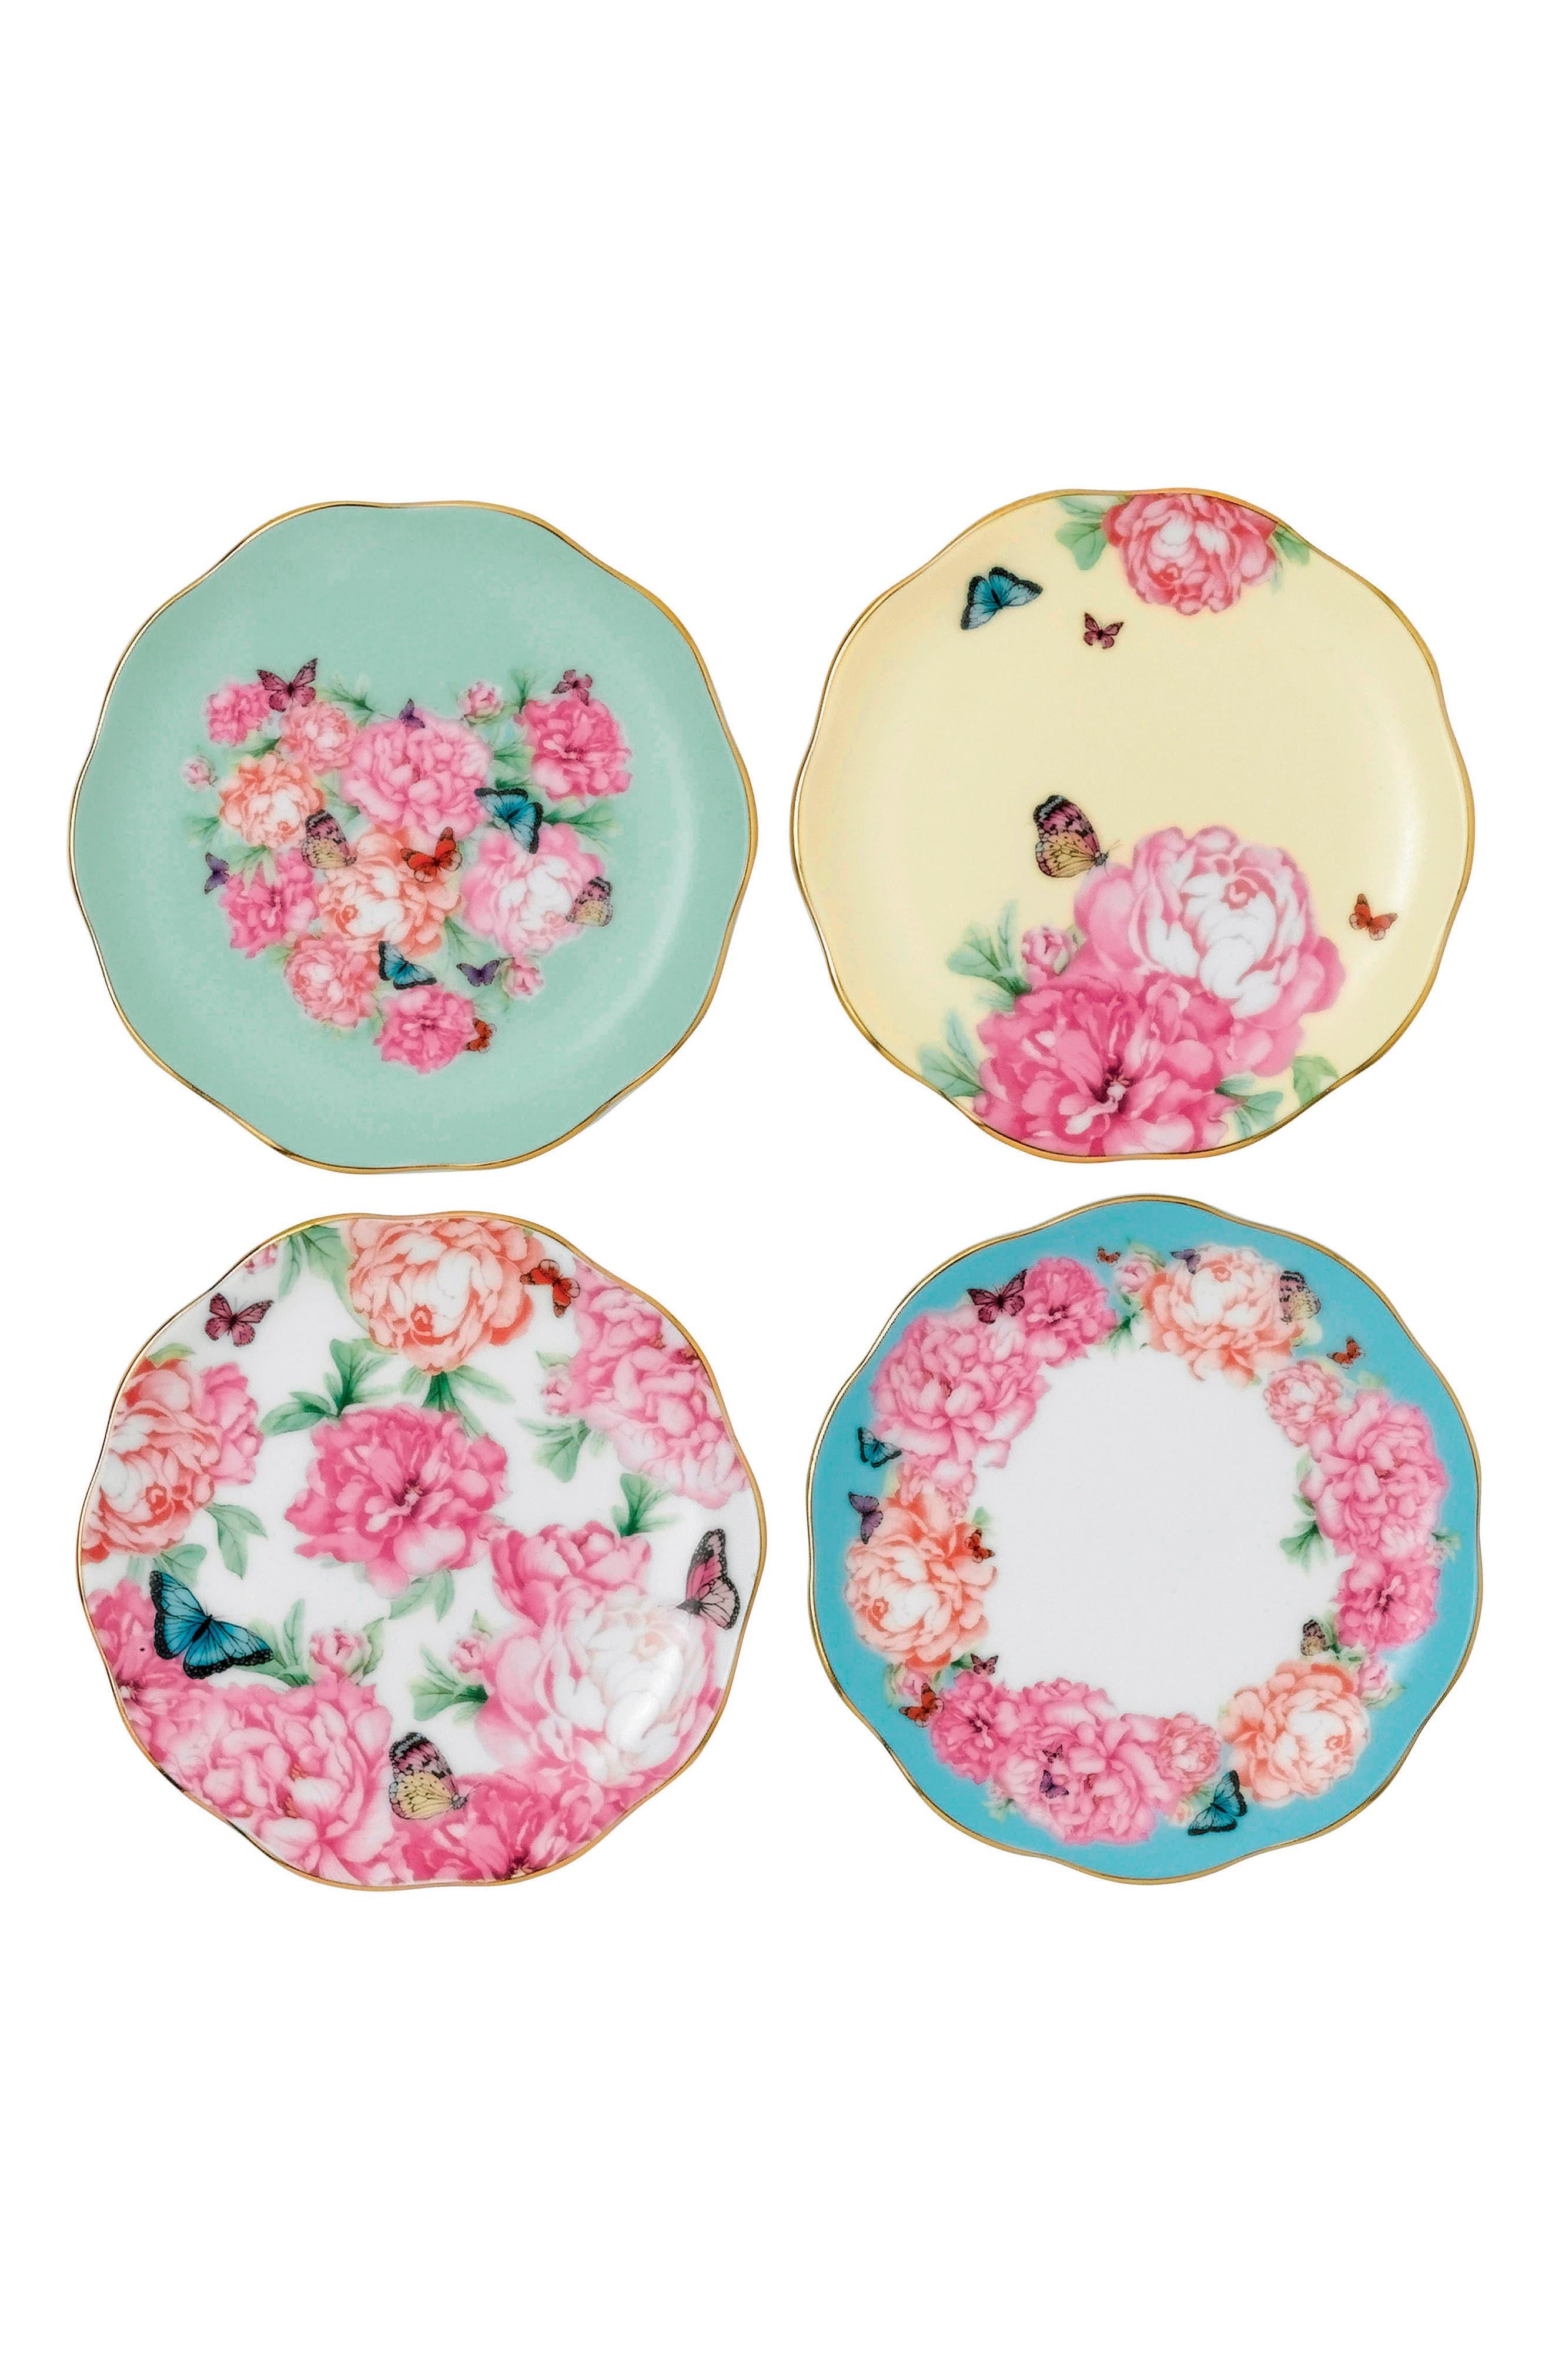 Alternate Image 1 Selected - Miranda Kerr for Royal Albert Set of 4 Assorted Tidbit Plates